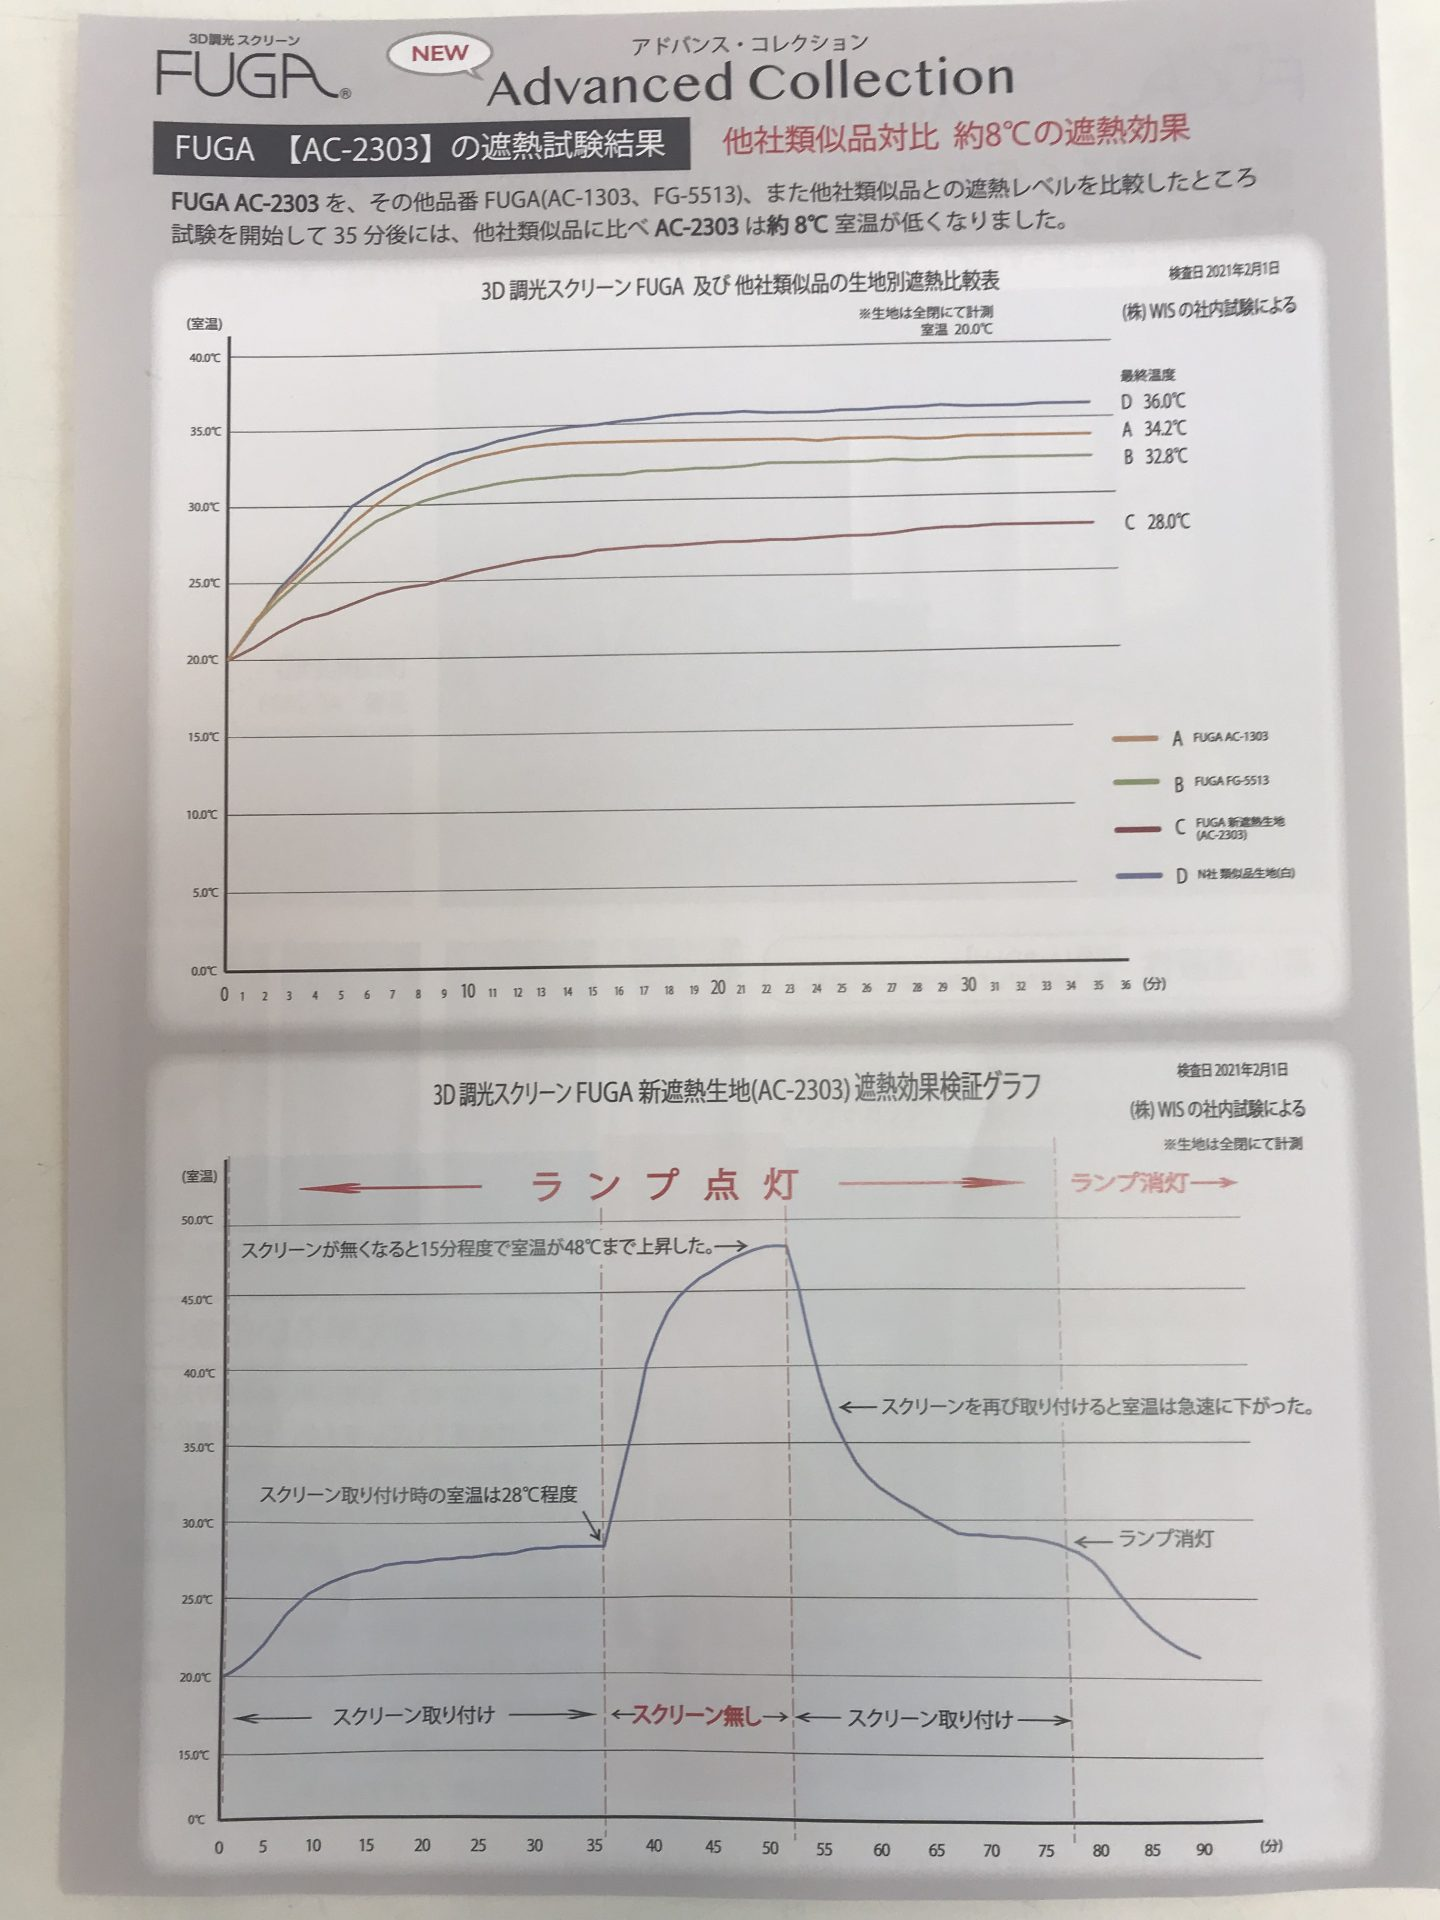 FUGA ACシリーズ遮熱データ